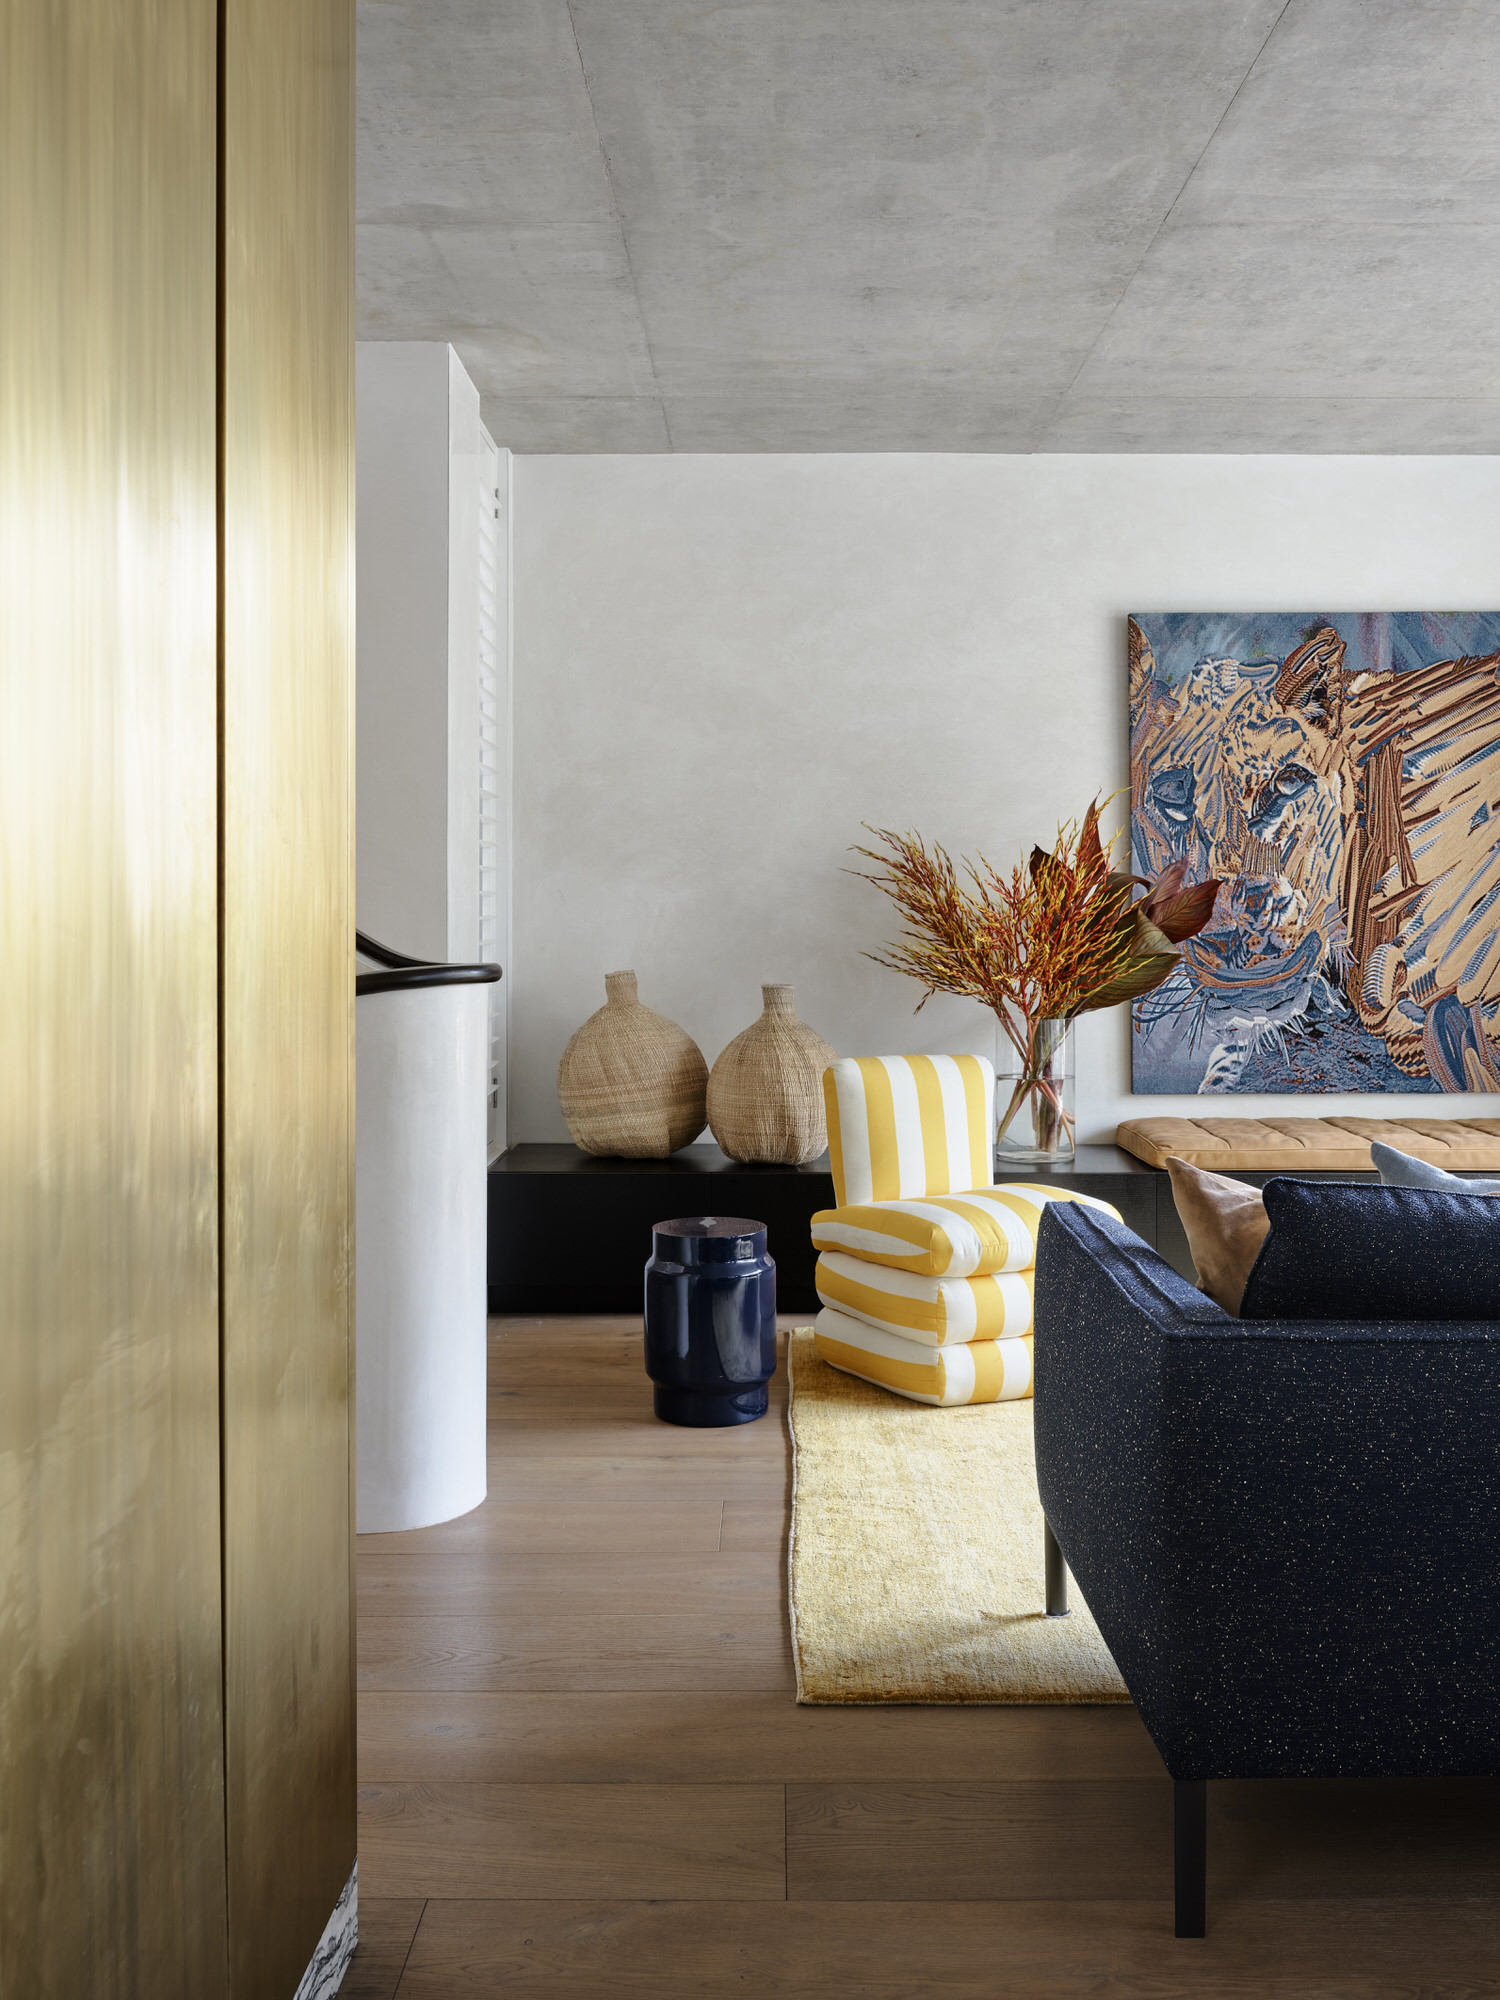 Potts Point St Neot Residence, Flack Studio, Luxury Australian Home, Photo Anson Smart | Yellowtrace